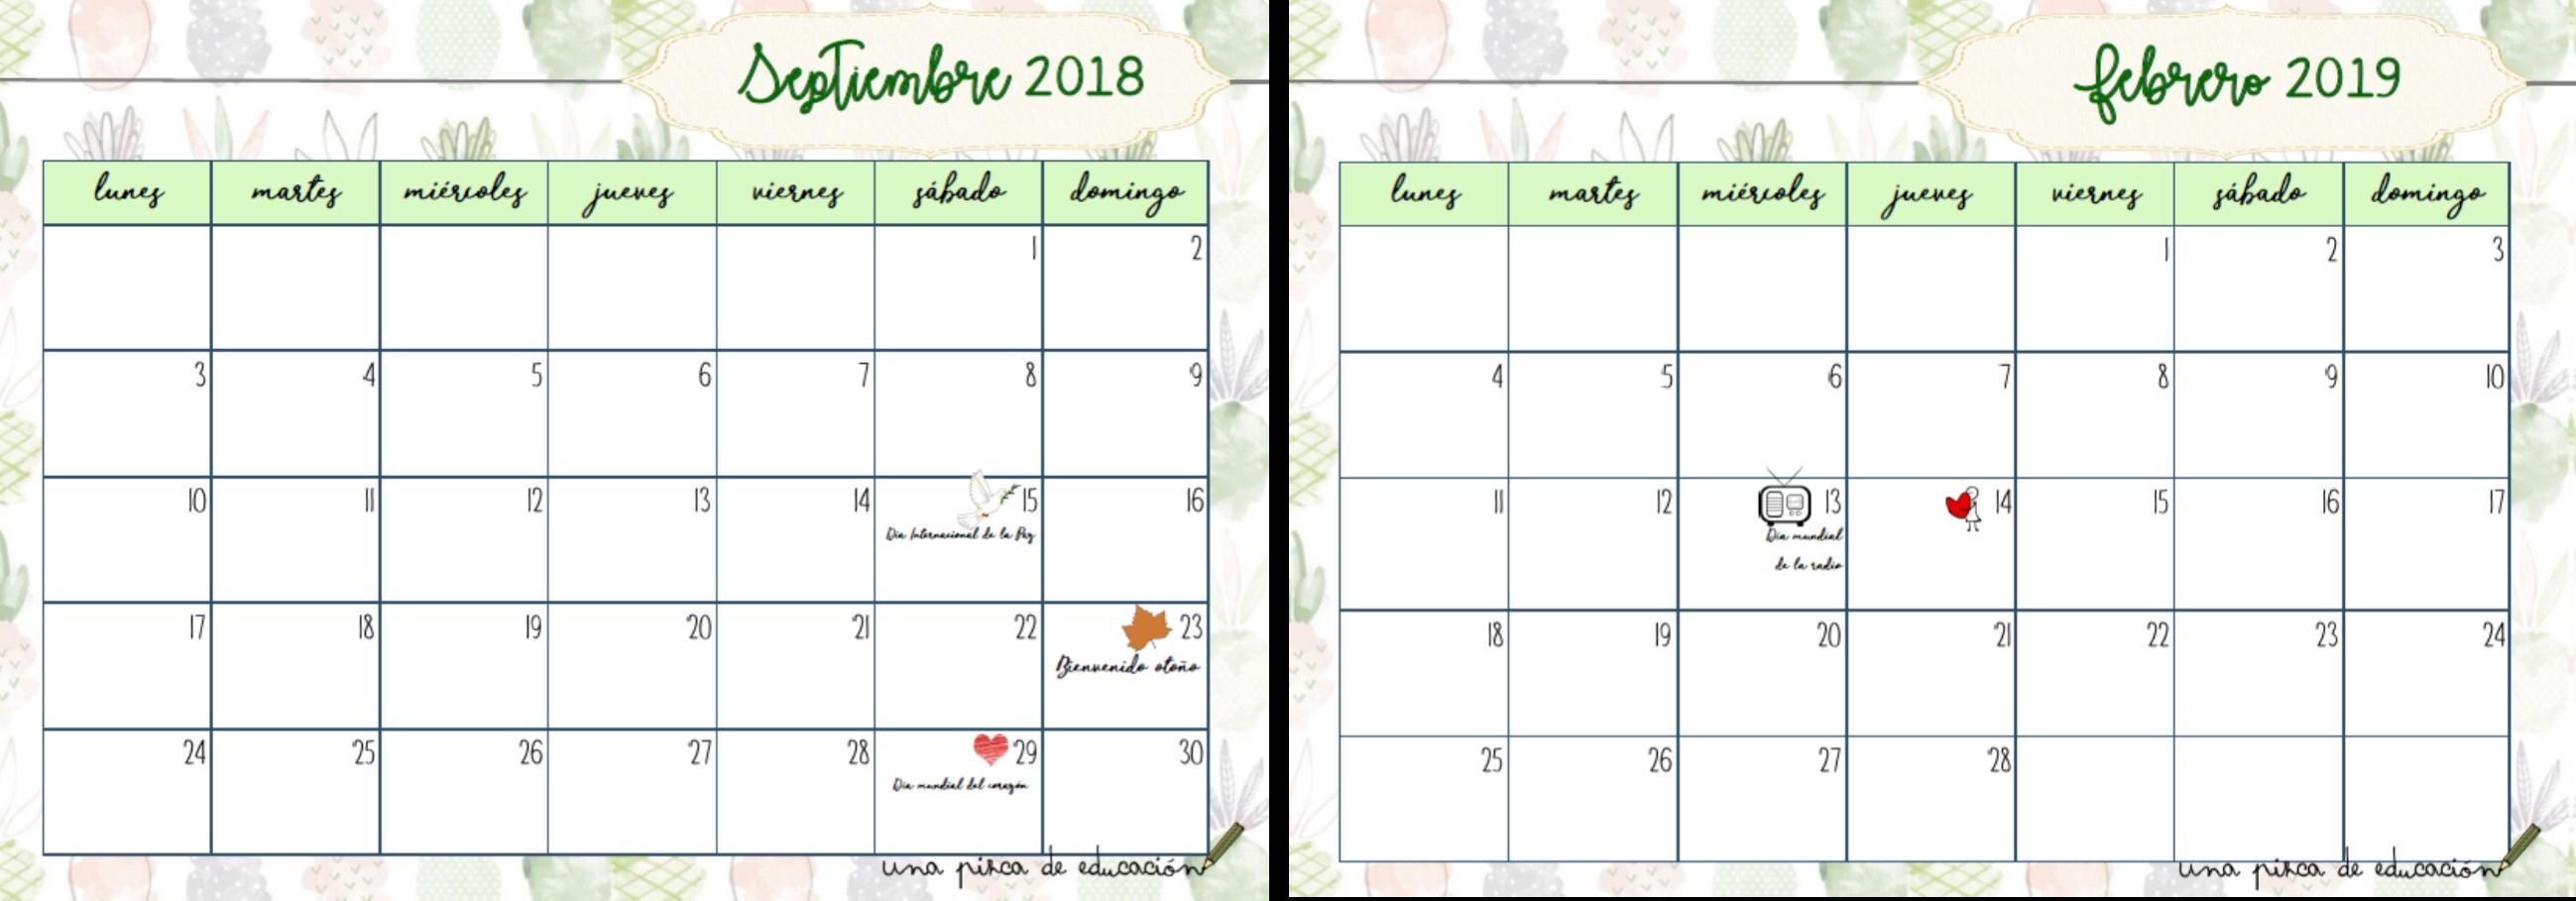 Este Es Realmente Calendario 2020 Febrero Para Imprimir in Calendario Zbinden 2020